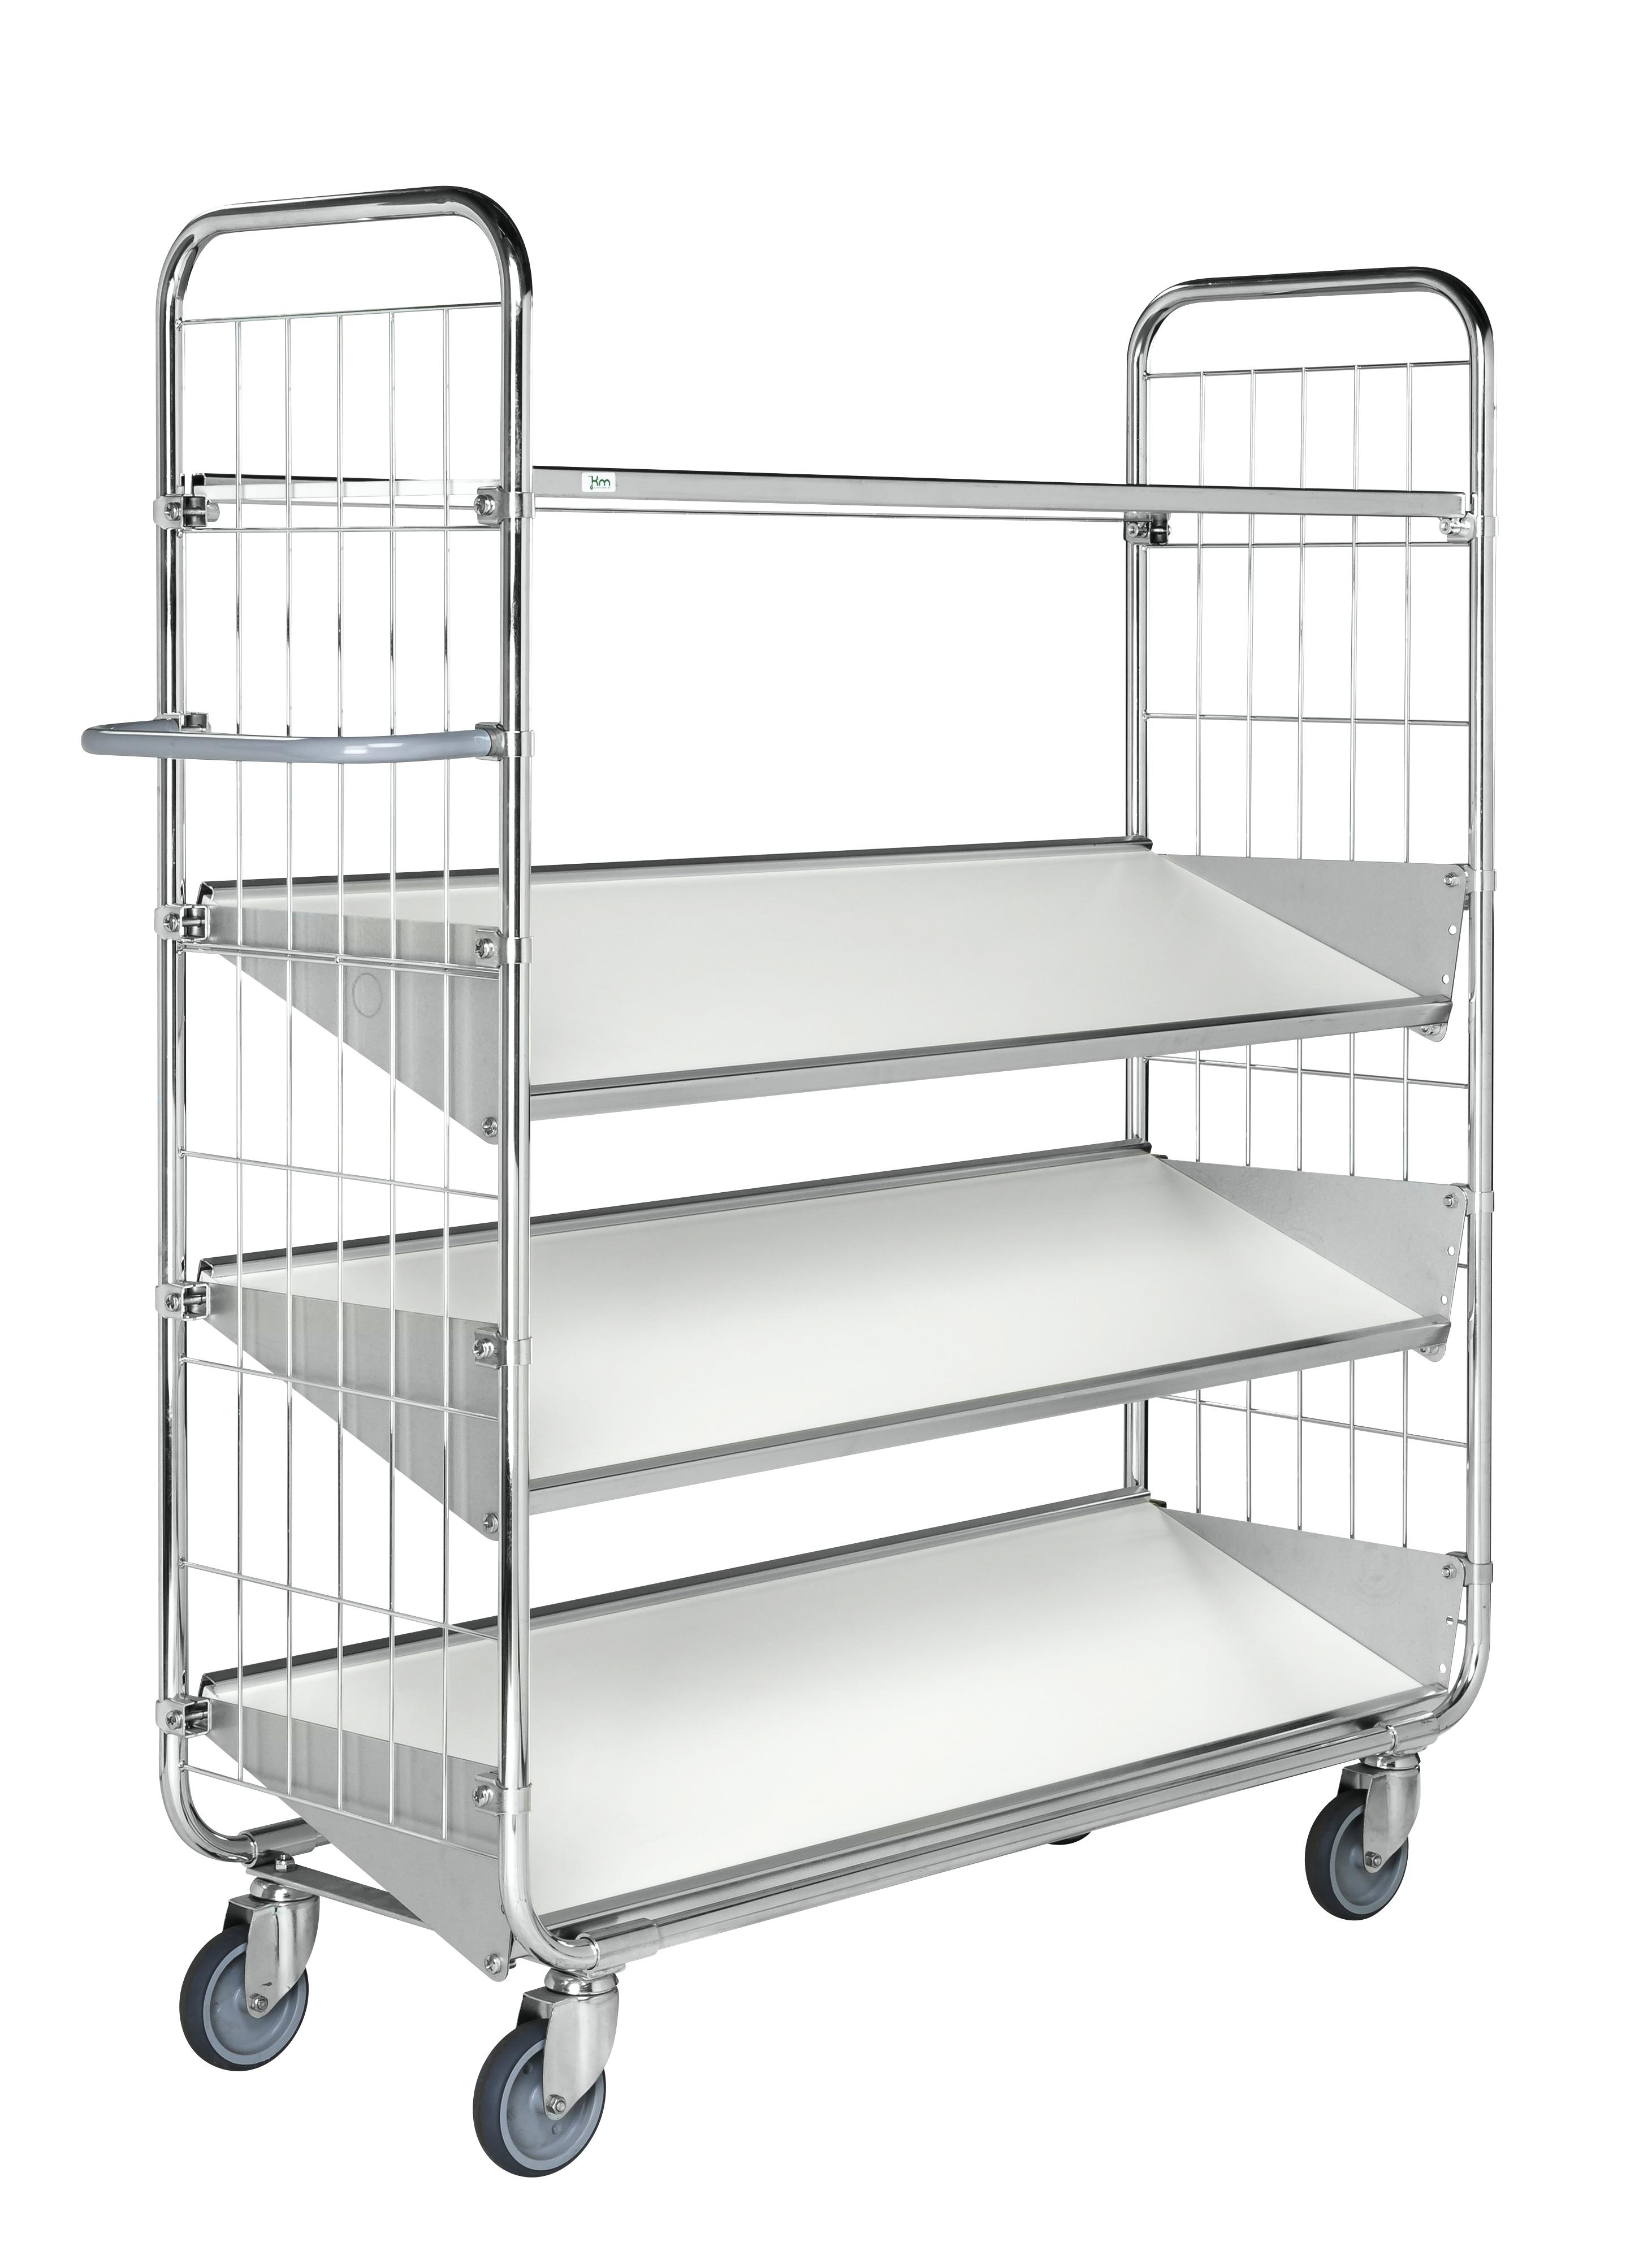 Serie 8000 Shelf KM8000-T